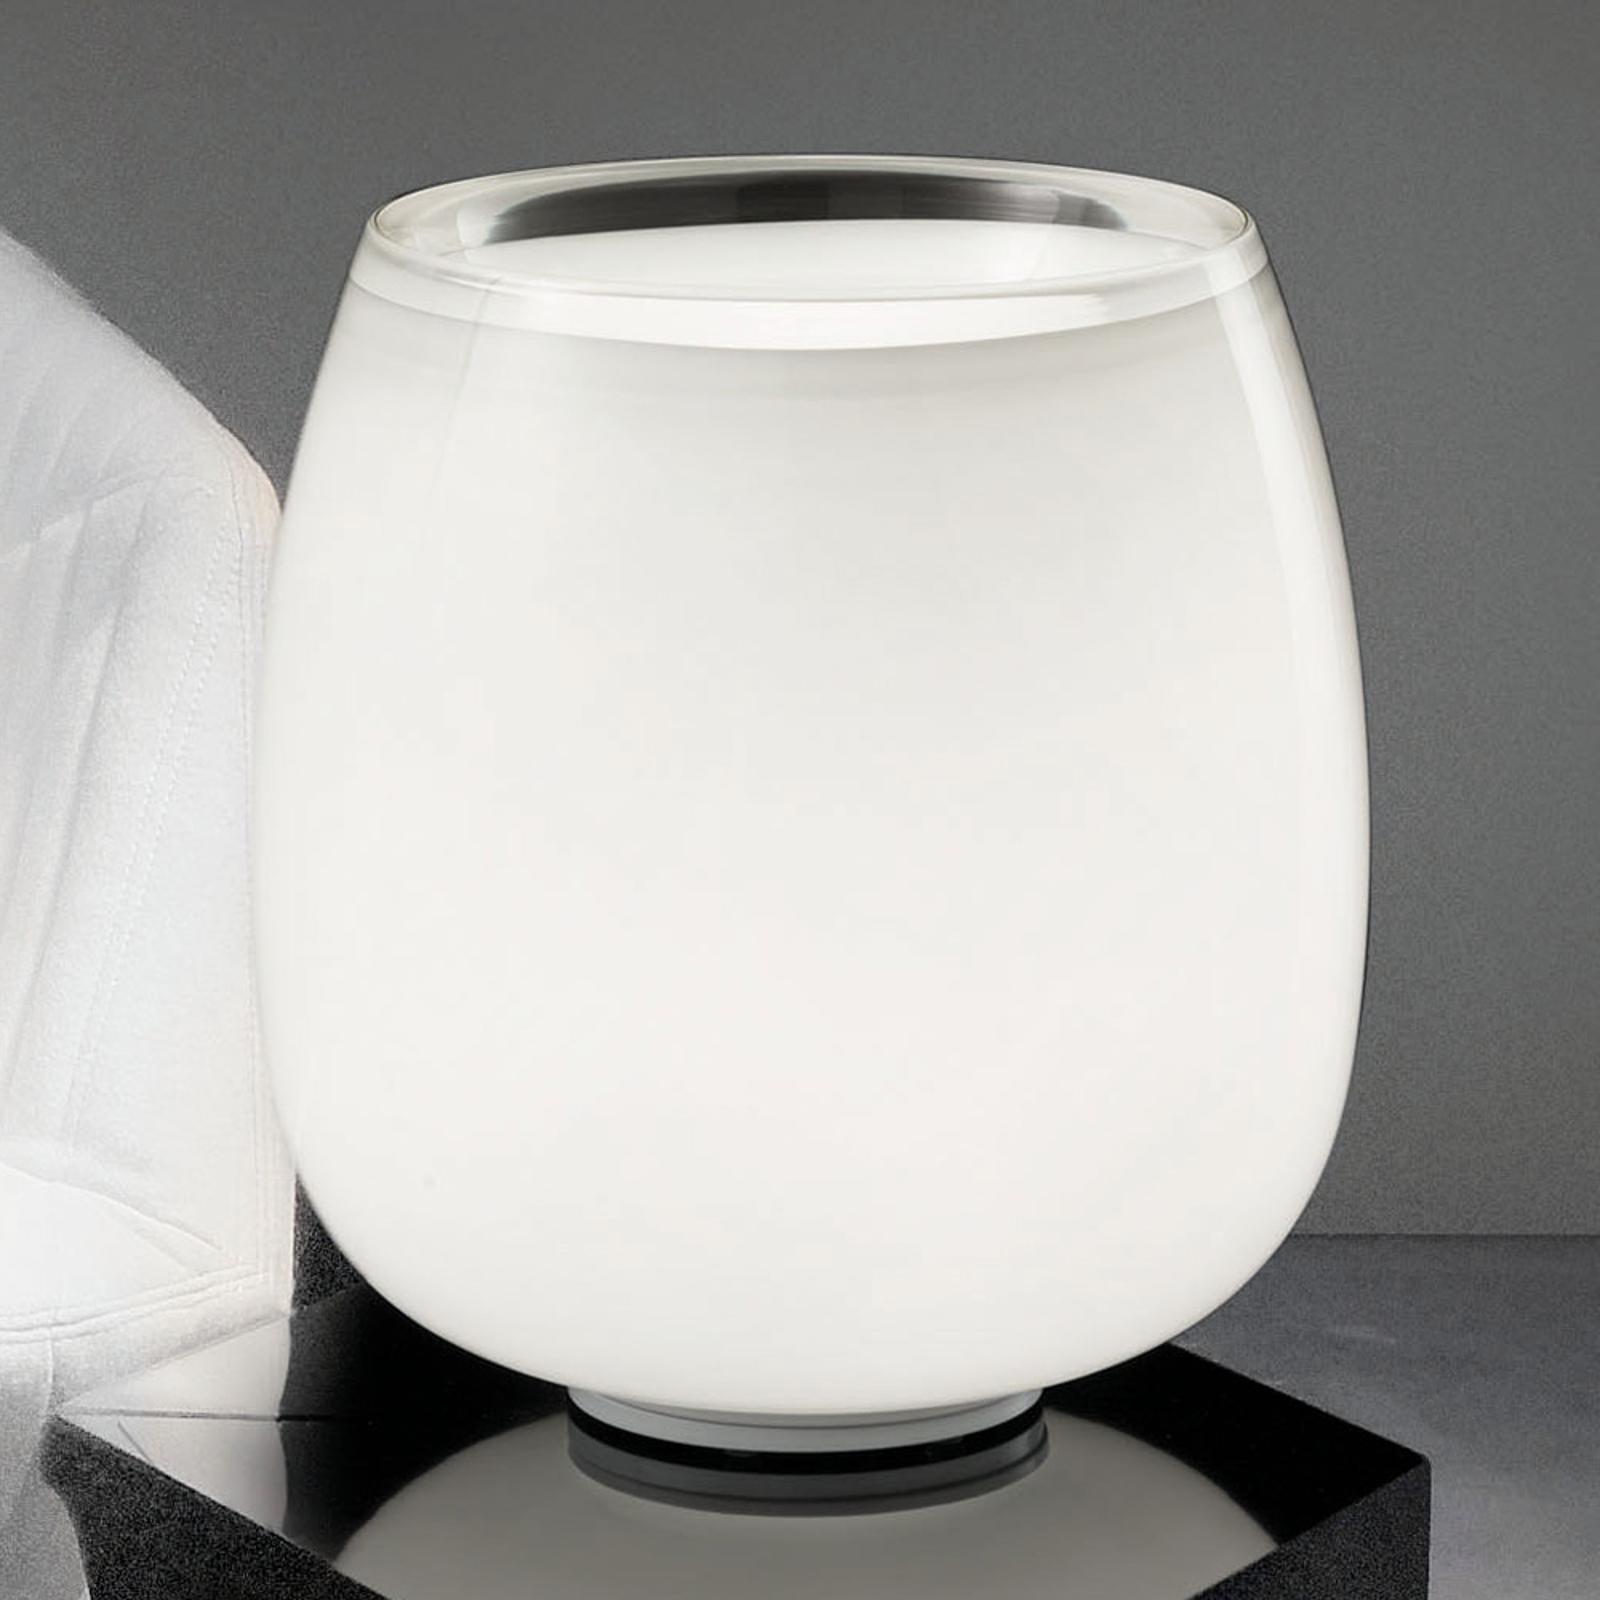 Implode - glazen tafellamp Ø 38 cm